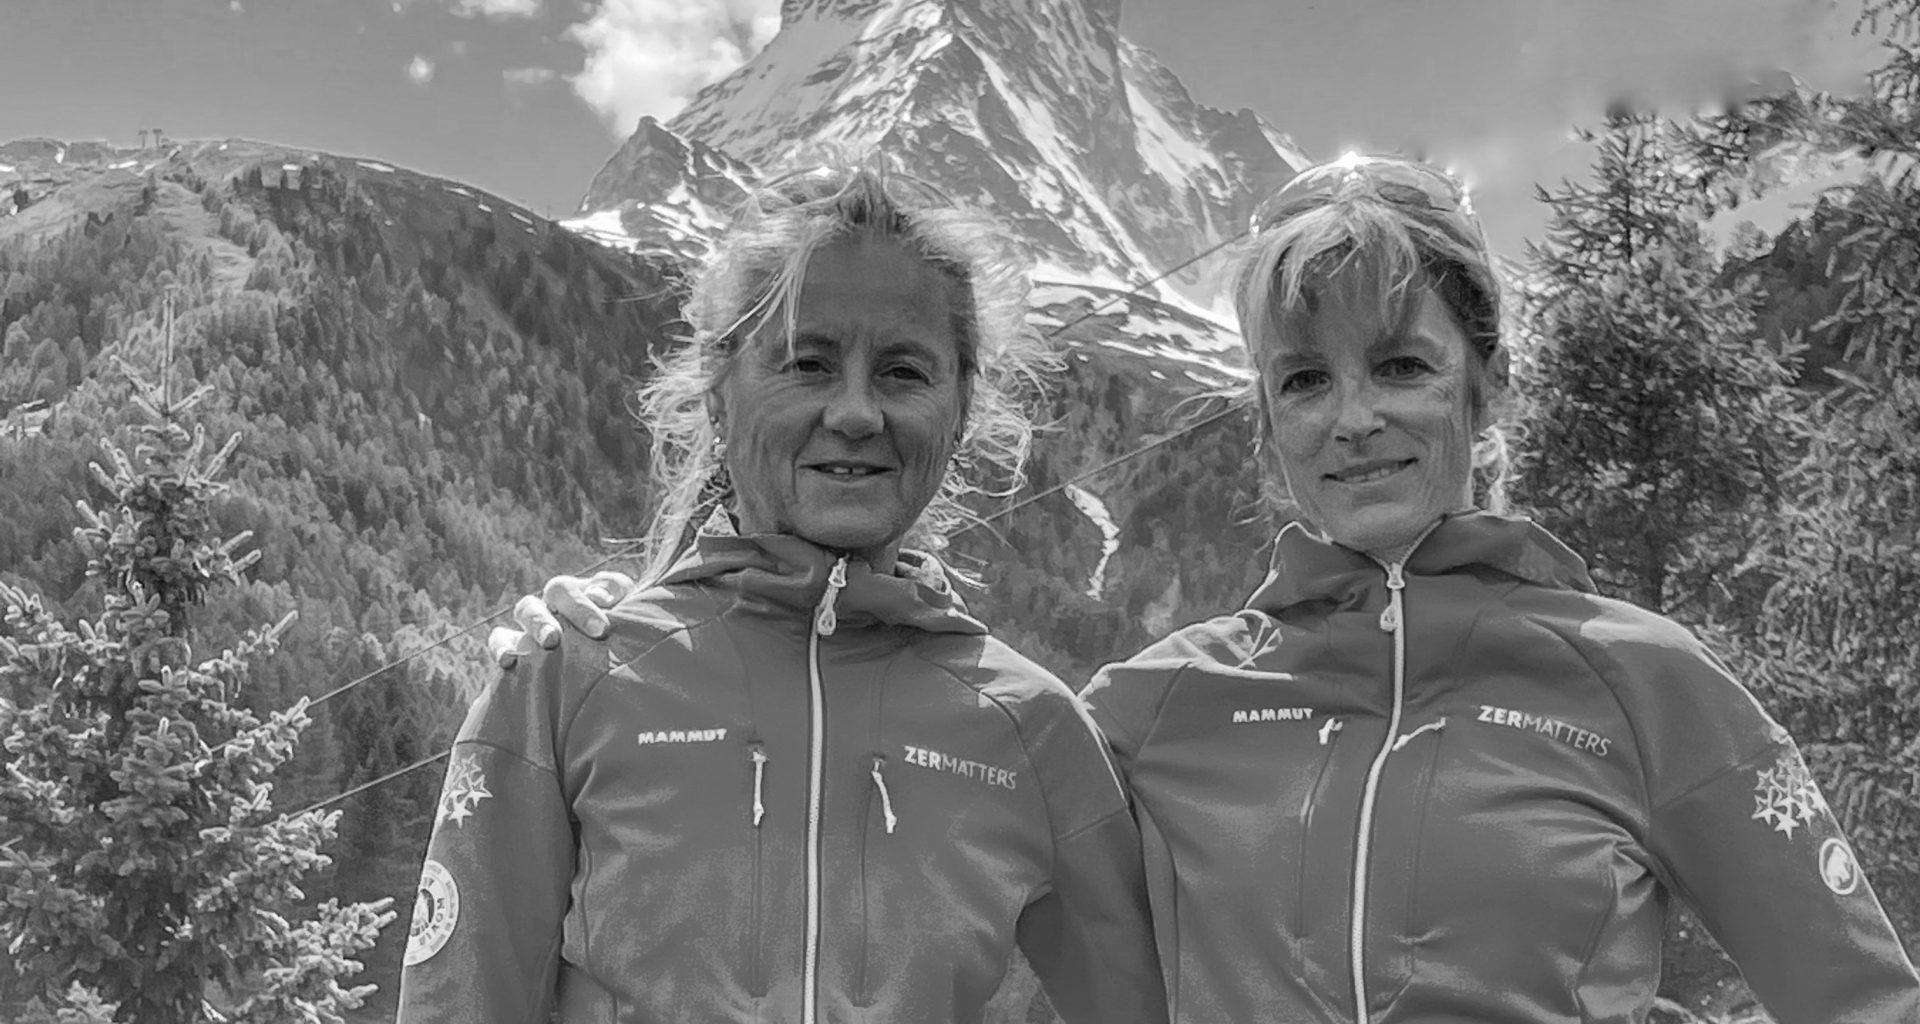 Bergführerinnen Bettina & Suzanne